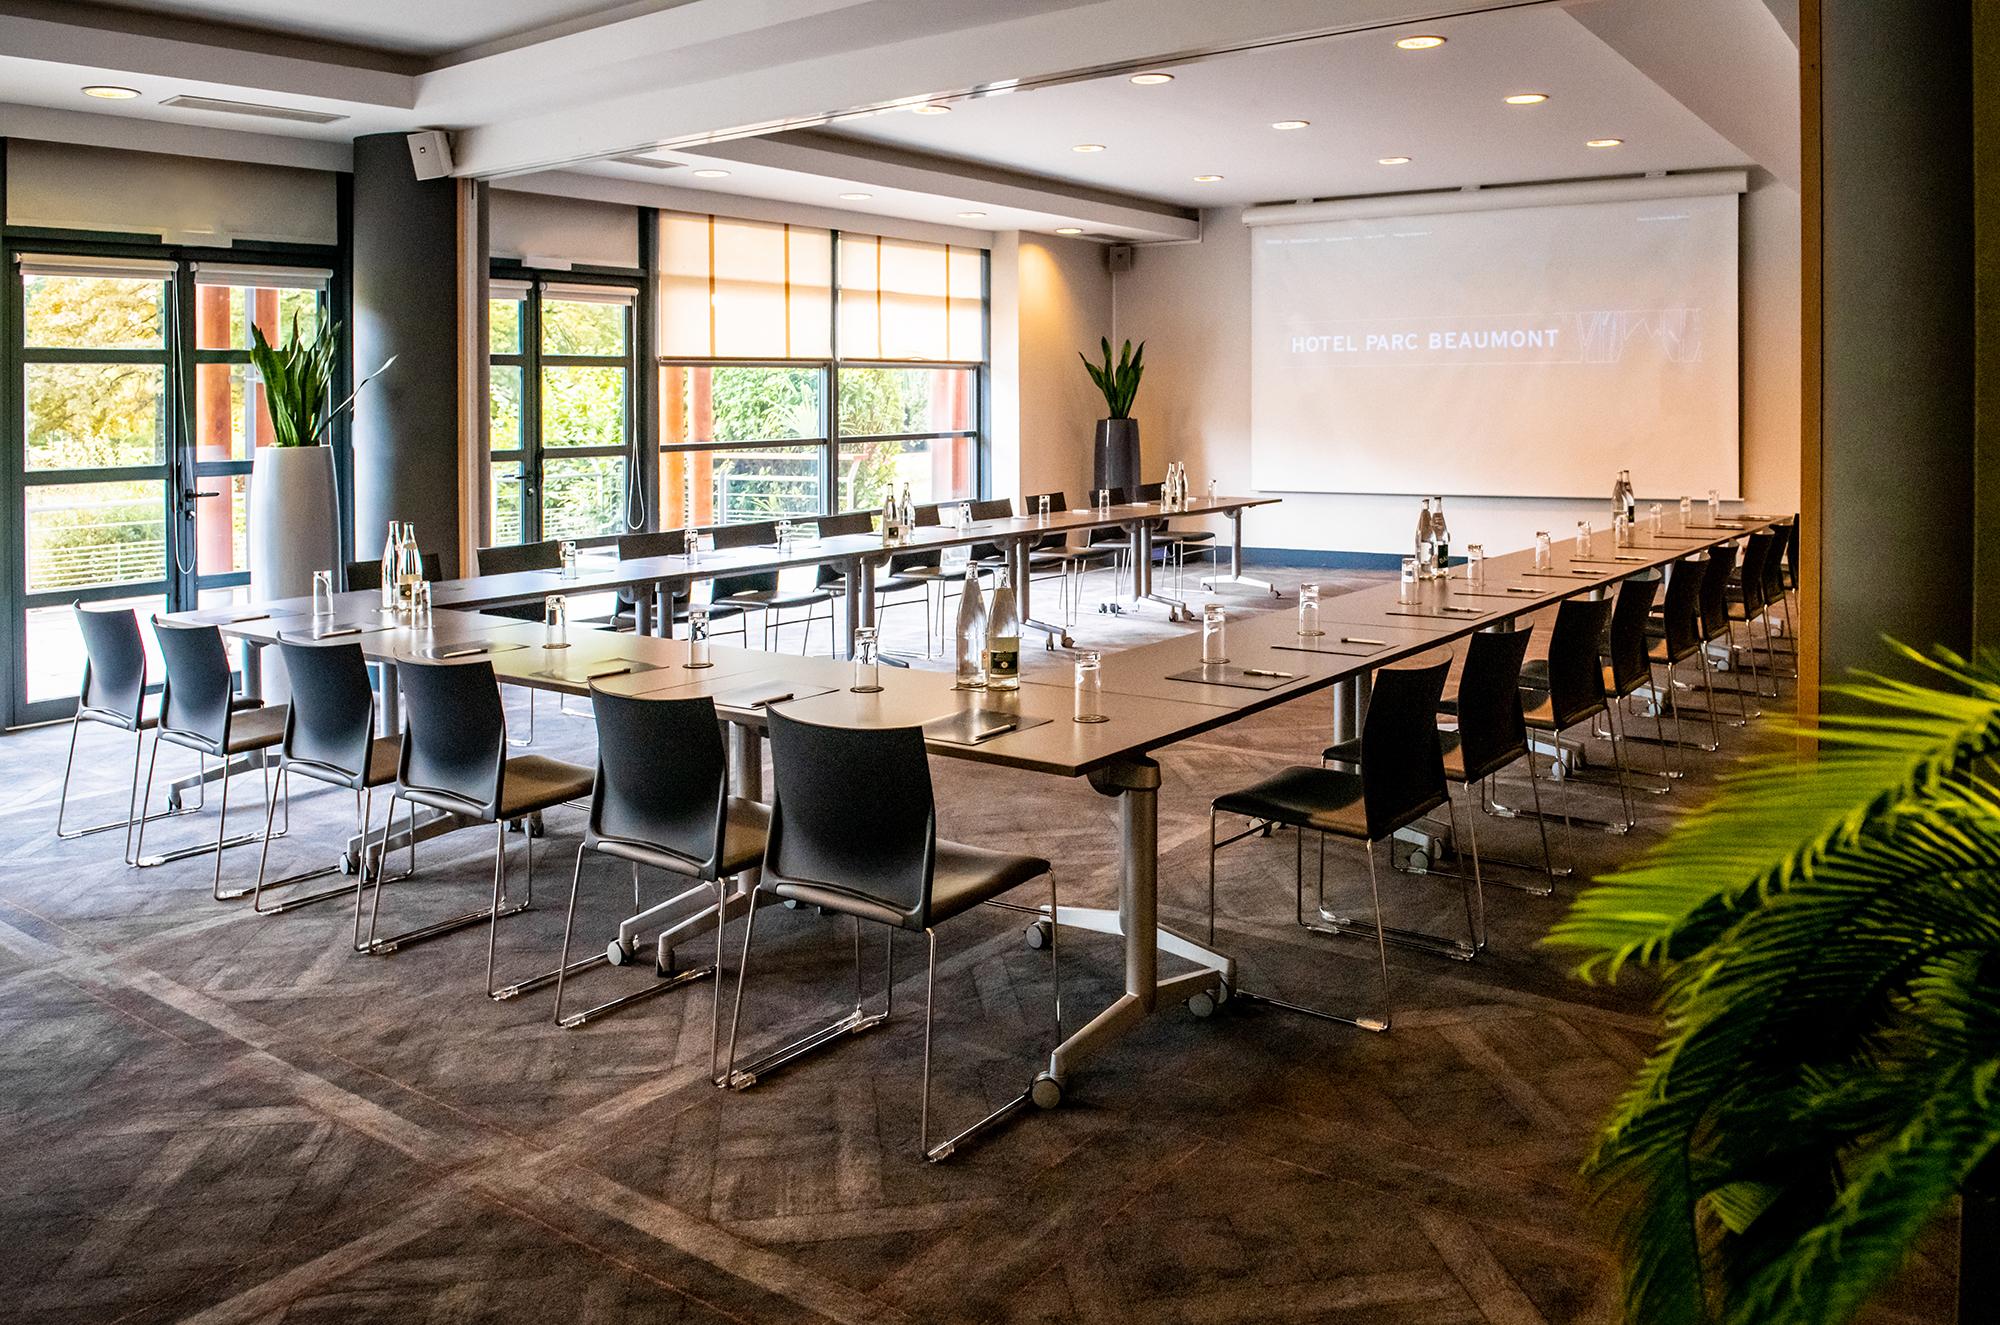 Meeting on the ground floor - Hôtel Parc Beaumont, Pau